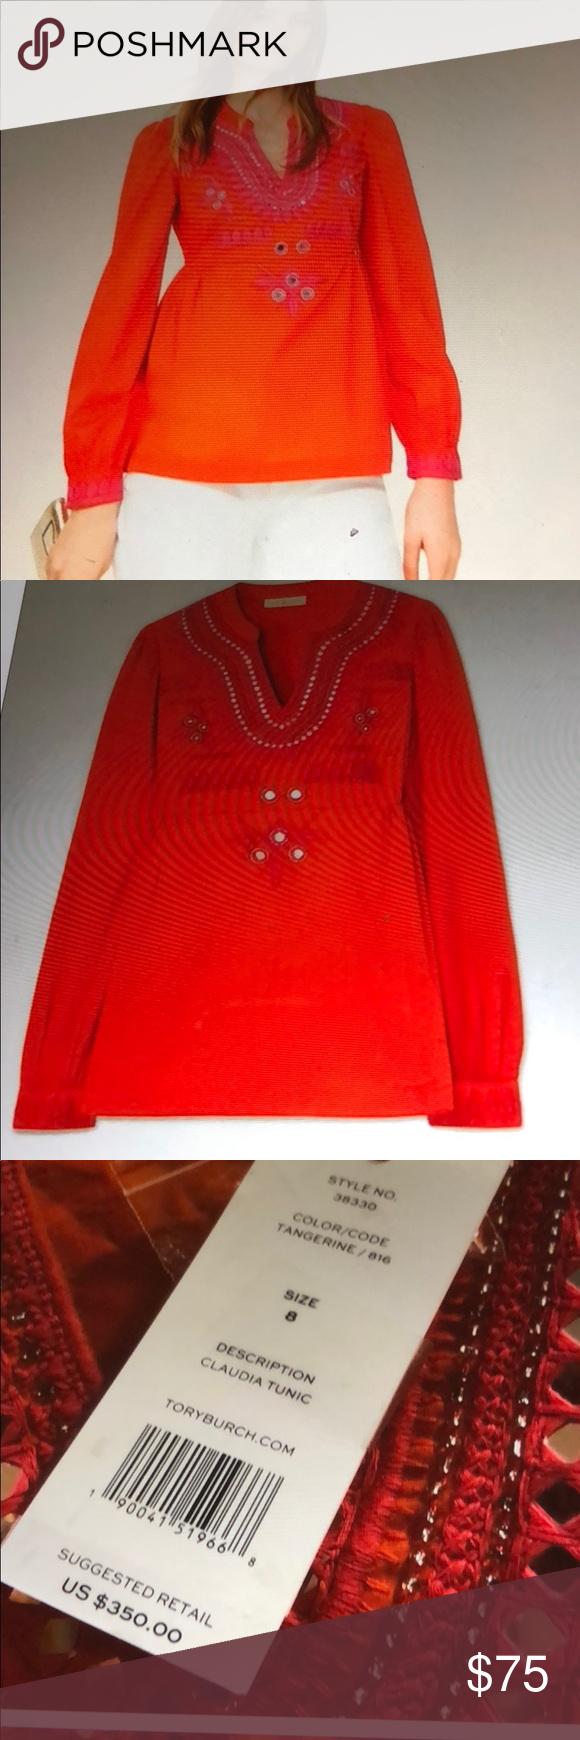 b48b9533199 NWT Tory Burch Claudia Tunic Stunning orange Tory Burch Claudia Tunic.  Features fuschia embroidery, mirrored sequins & a hidden side zipper for a  more ...